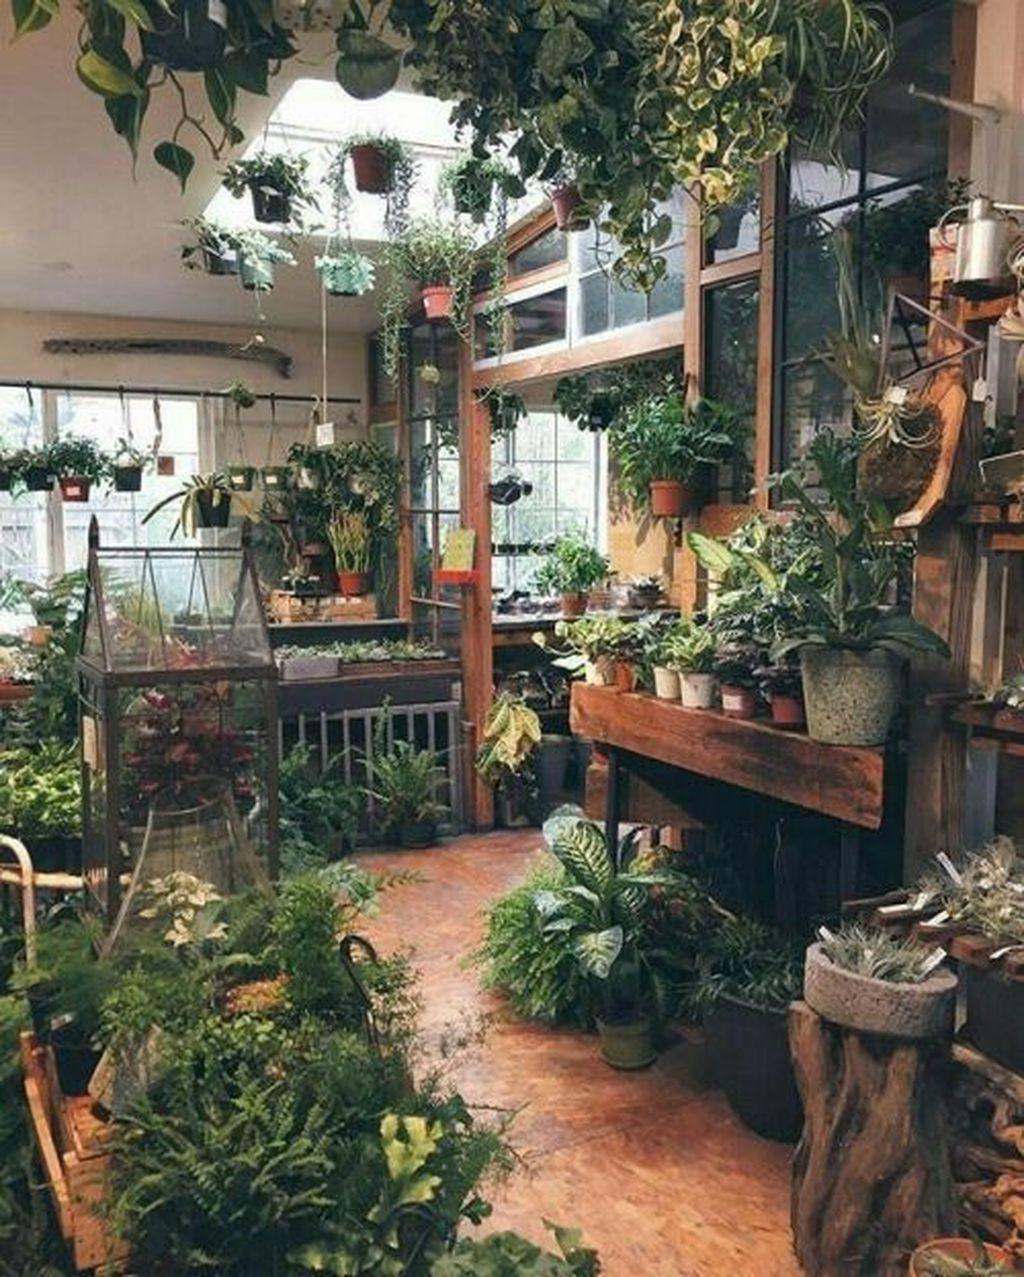 Inspiring Indoor Plans Garden Ideas To Makes Your Home More Cozier 65